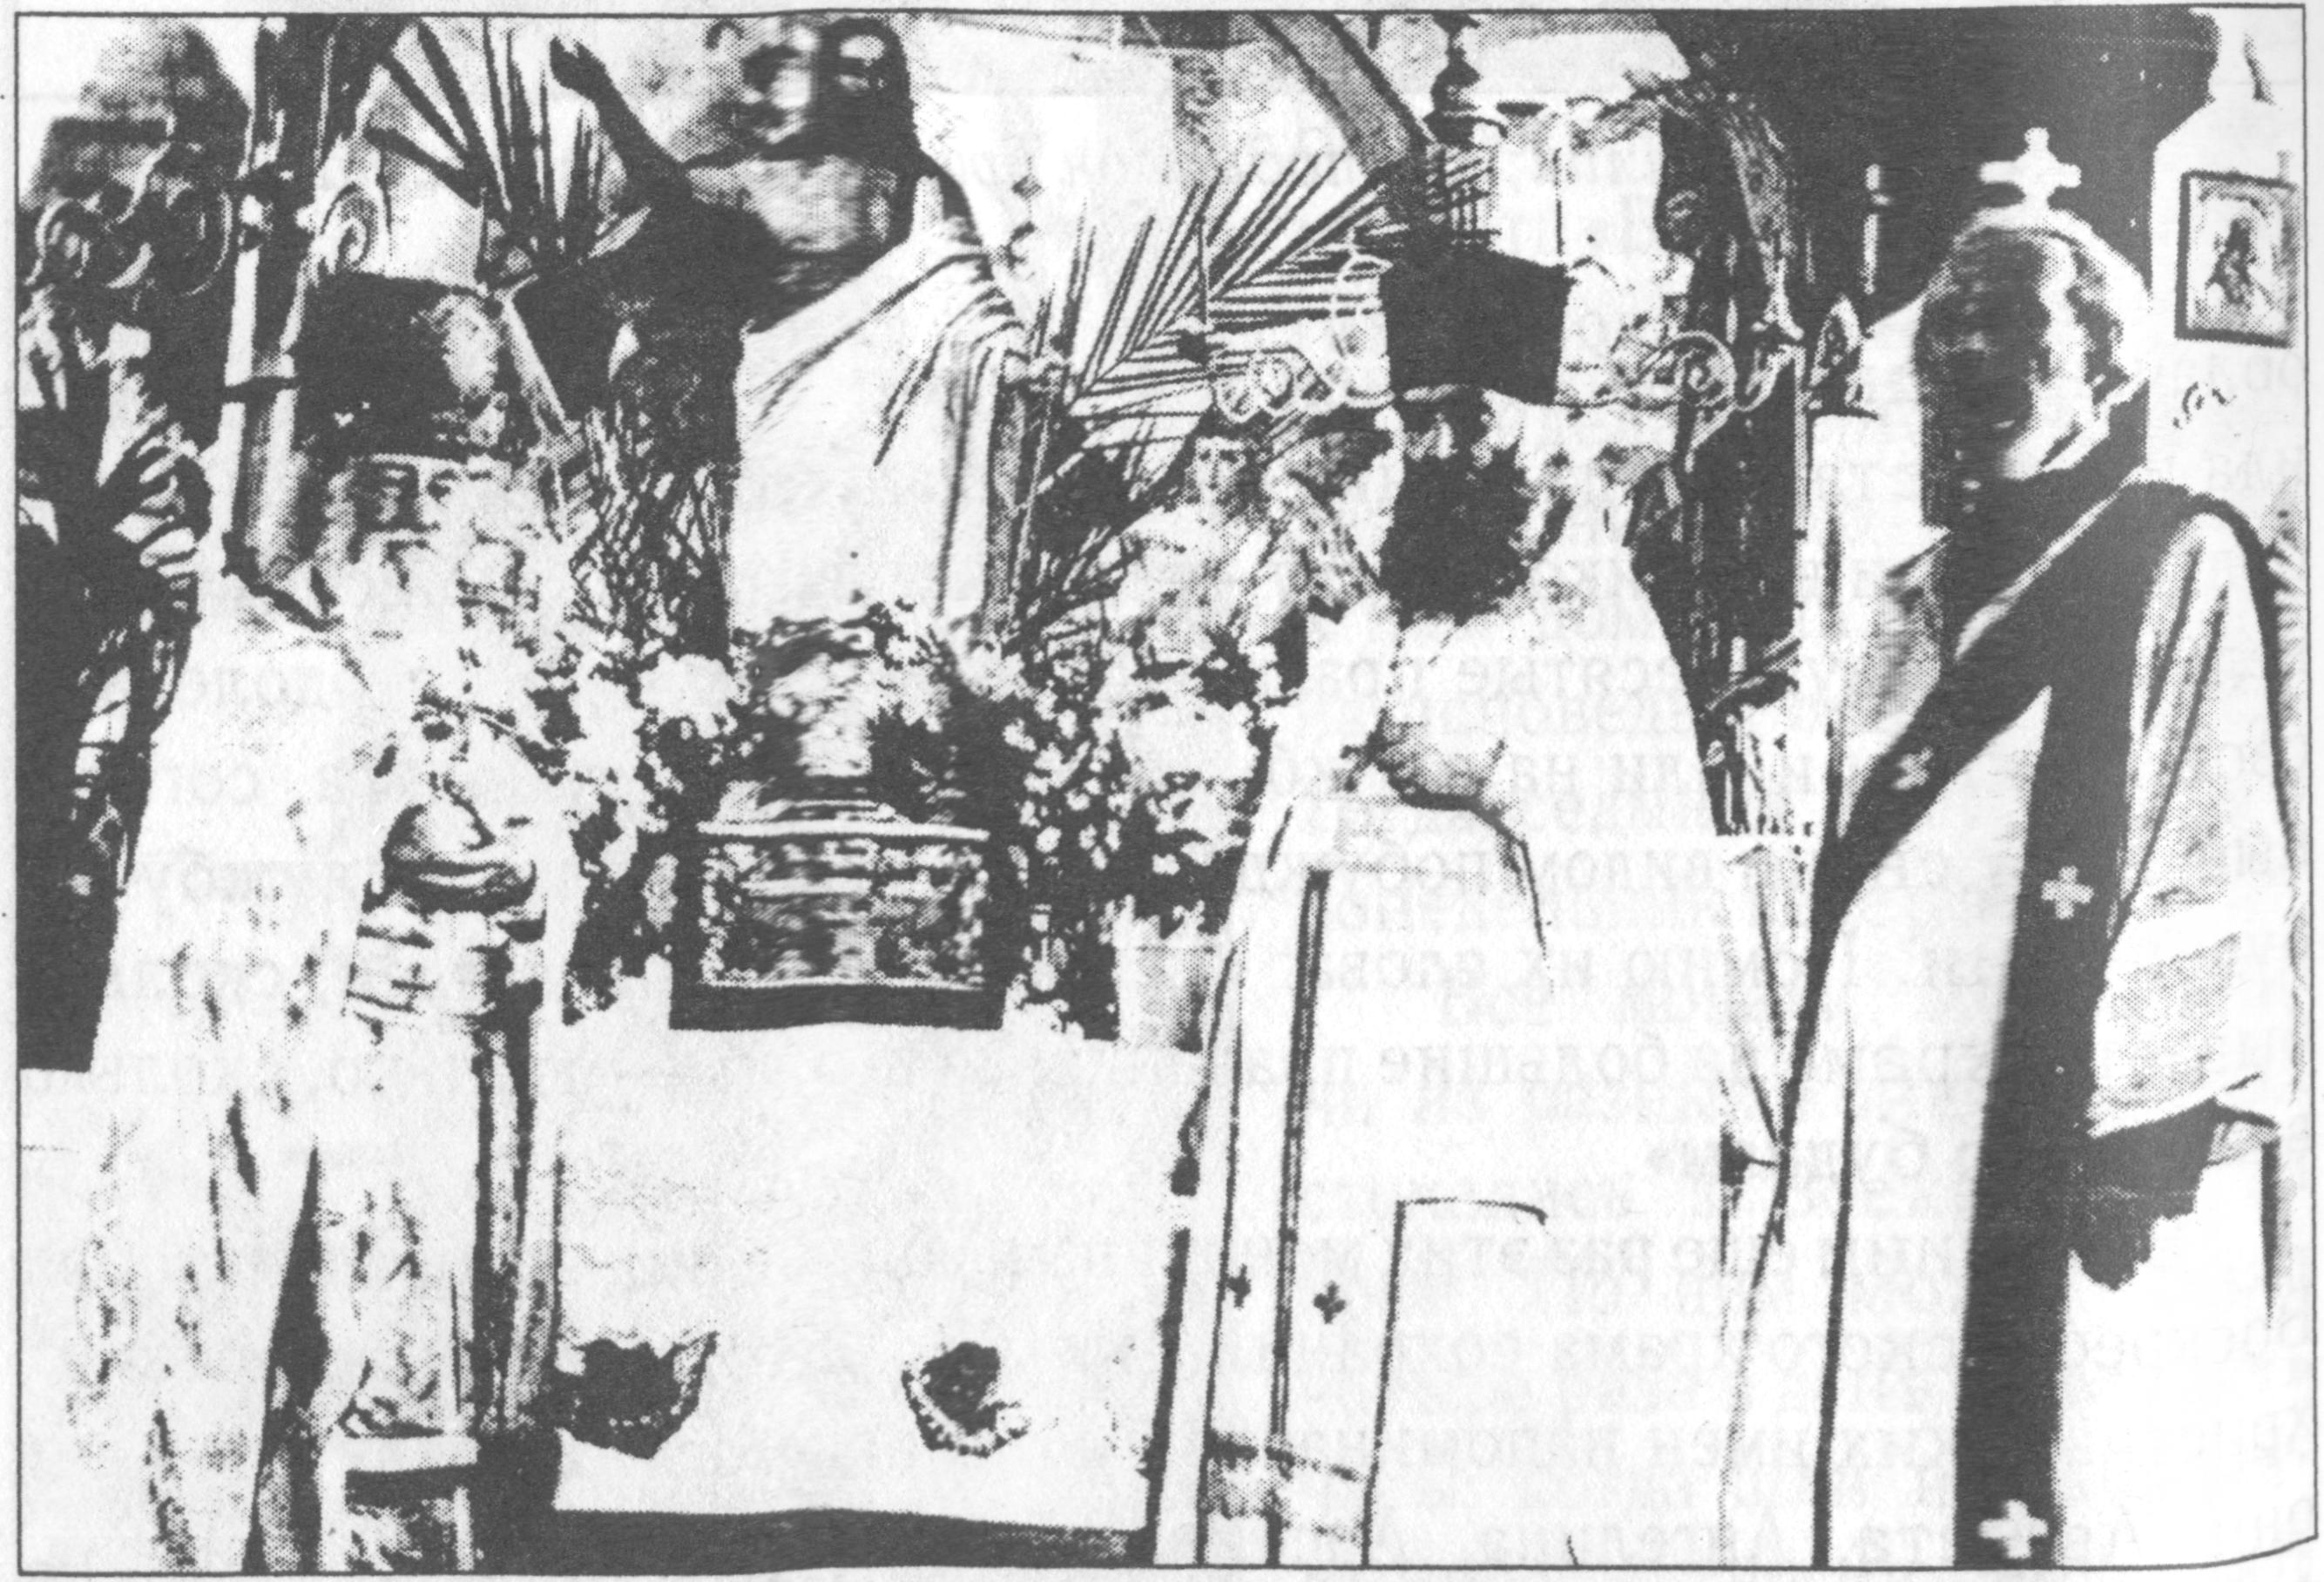 Отец Александр Щепинский, отец Василий Сергеев (благочинный), протодиакон Александр Бутко